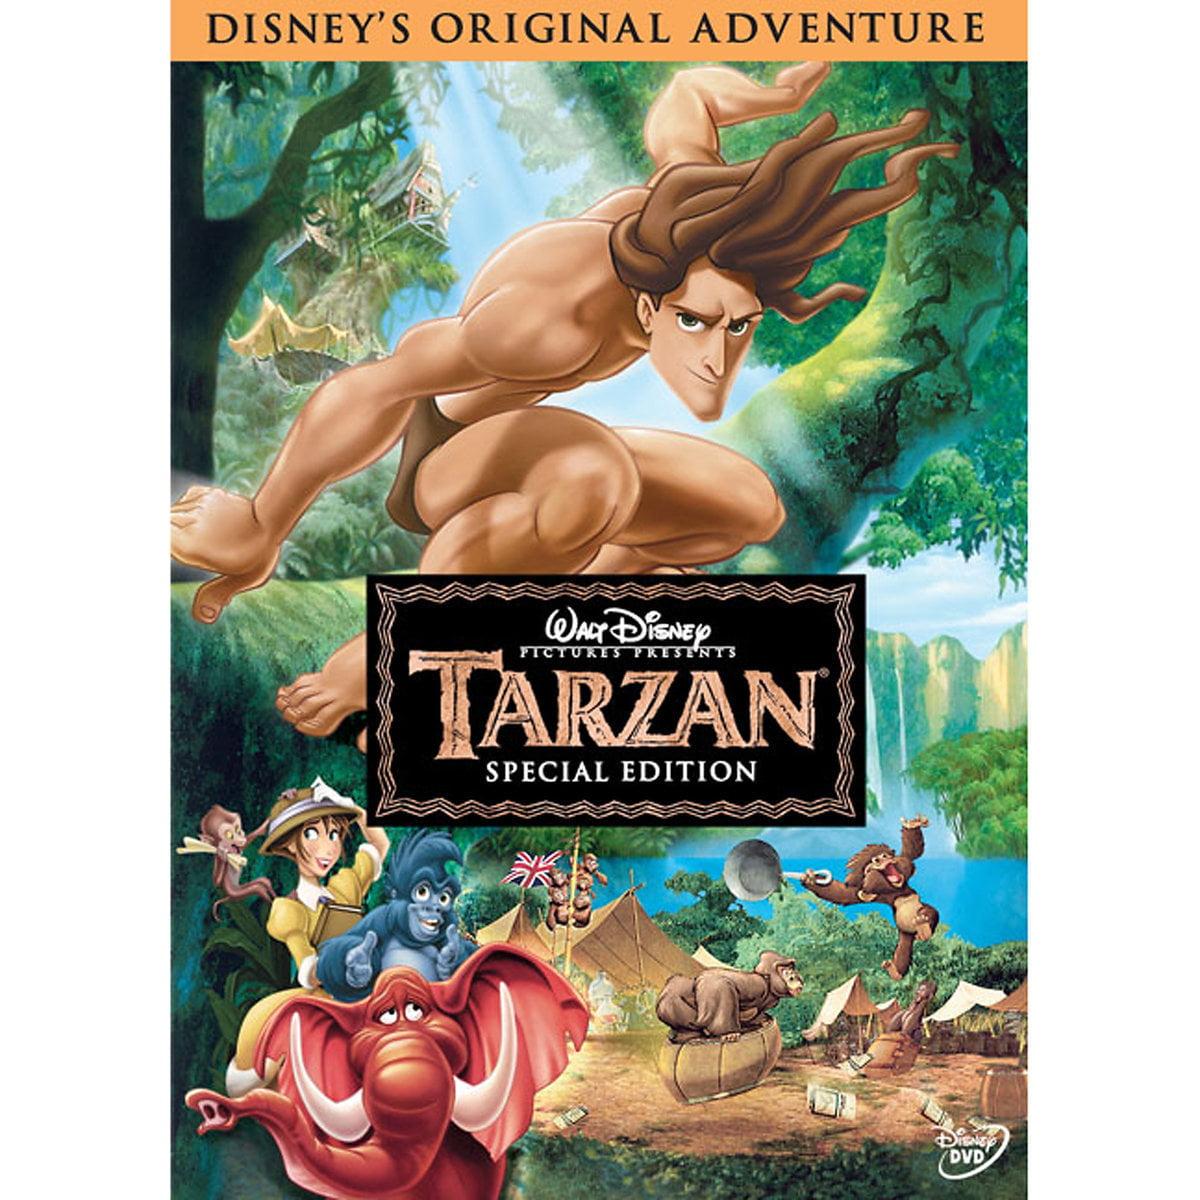 Tarzan (Special Edition) (DVD)